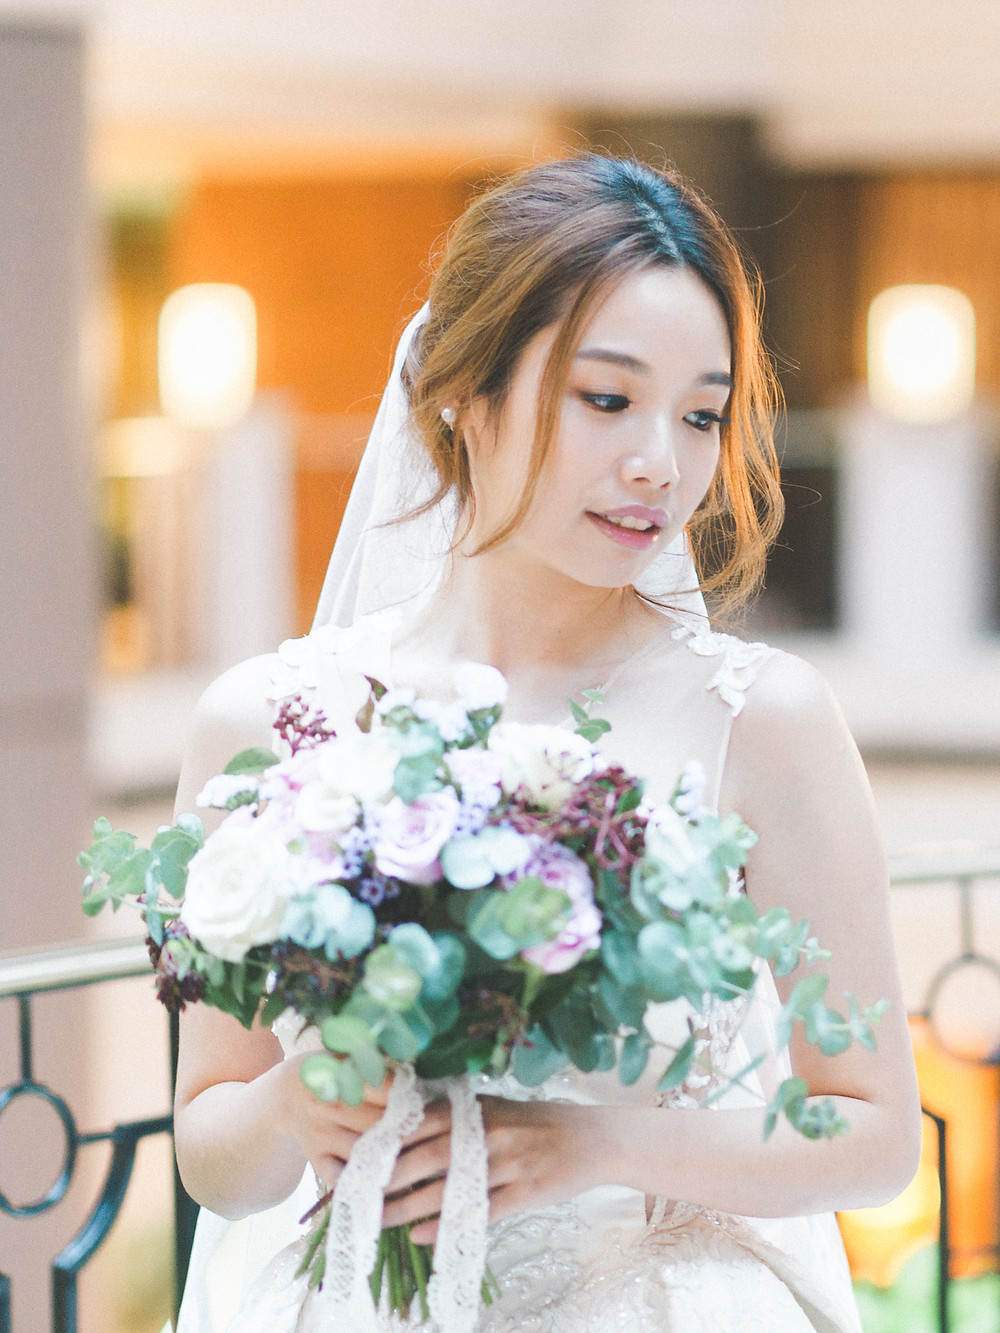 Sheng & ViolaWedding | Grand Hyatt Taipei 台北君悅飯店 Arther Chen Photography